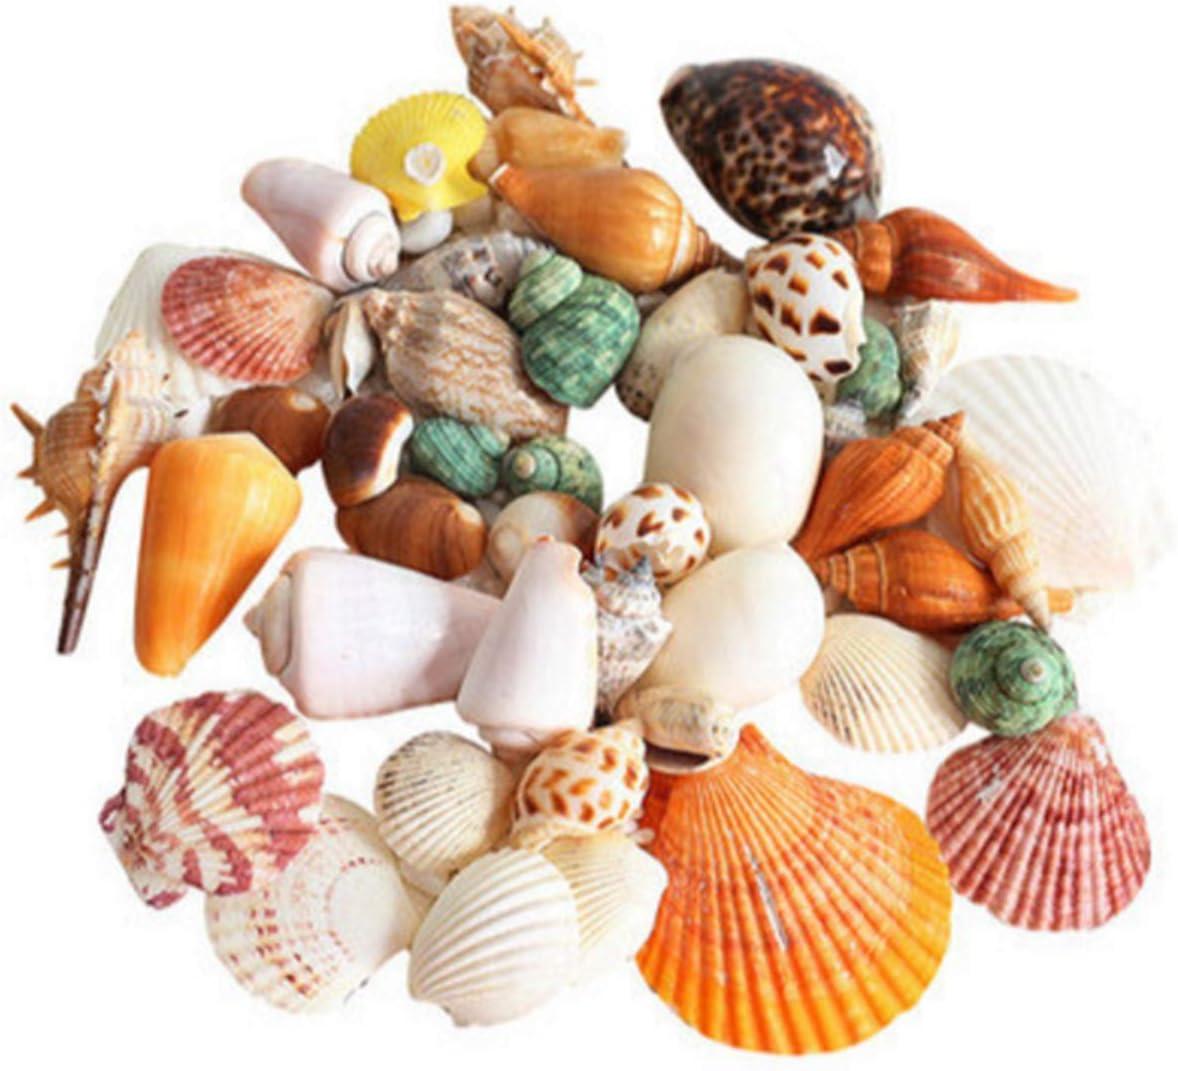 90 Pcs Sea Shells Mixed Ocean Beach Seashells, Colorful Natural Seashells Perfect Accents Fish Tank, Home Decorations, Beach Theme Party, Candle Making, Wedding Decor, DIY Crafts, Fish Tan